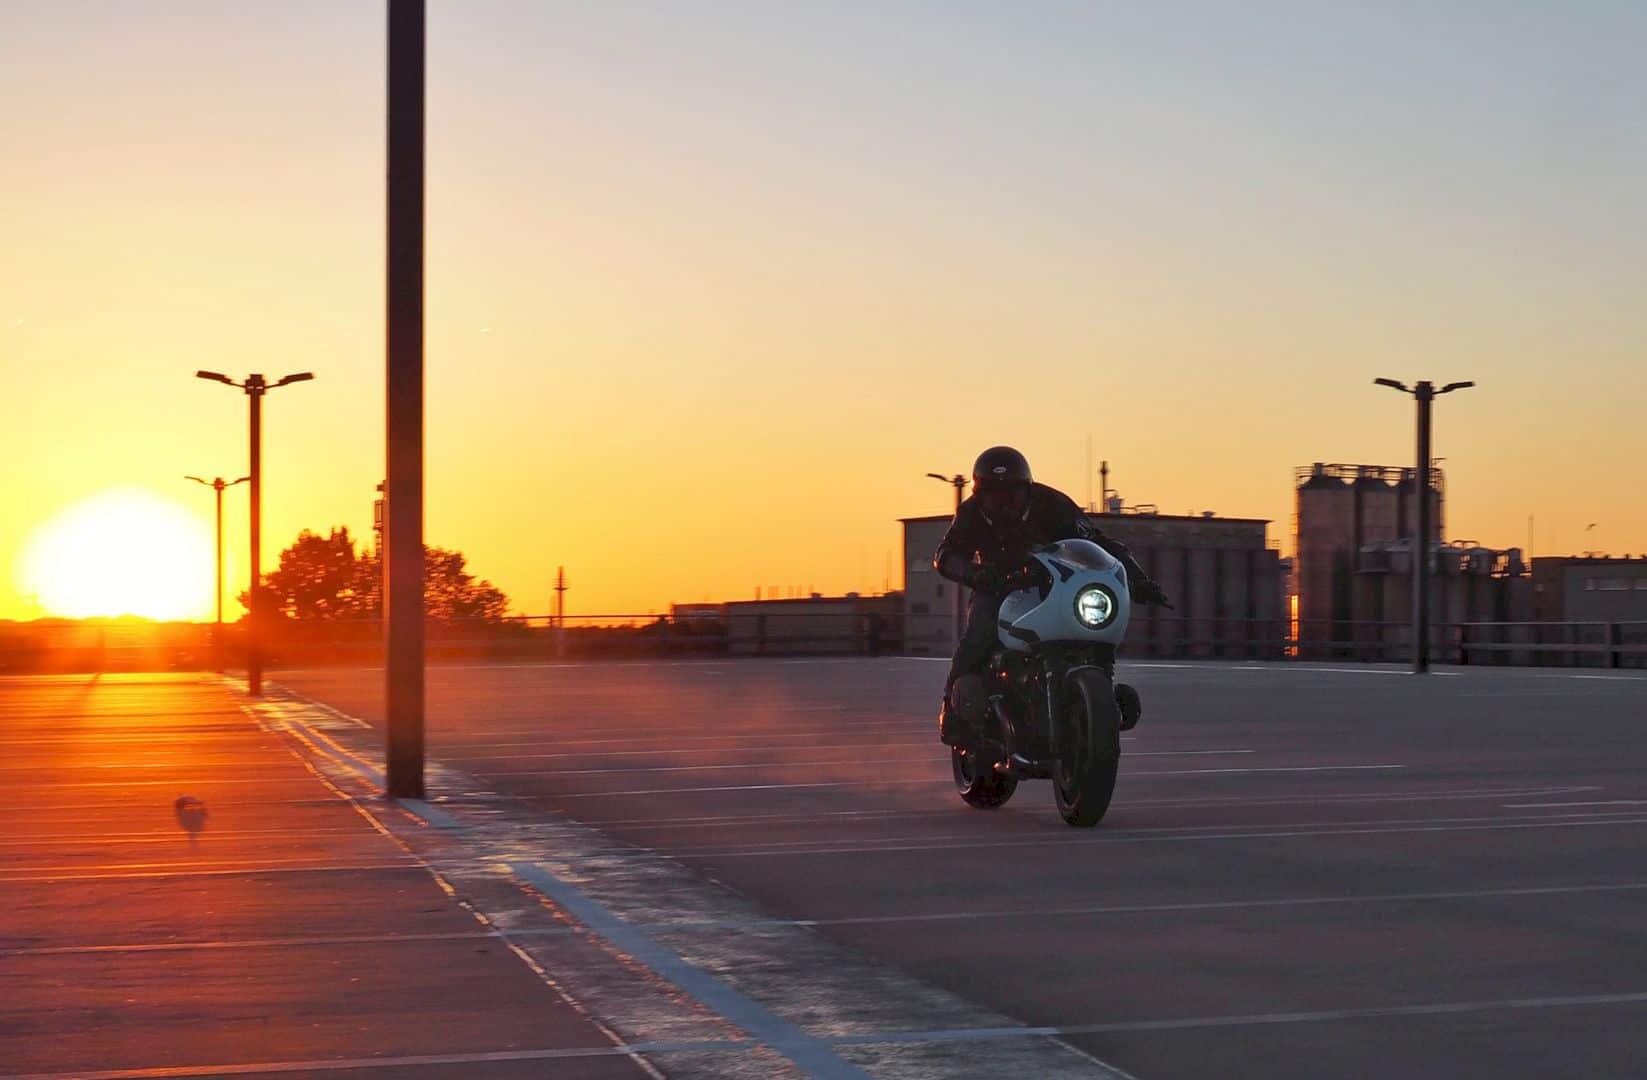 Bmw Ninet Racer By Jvb Moto 5